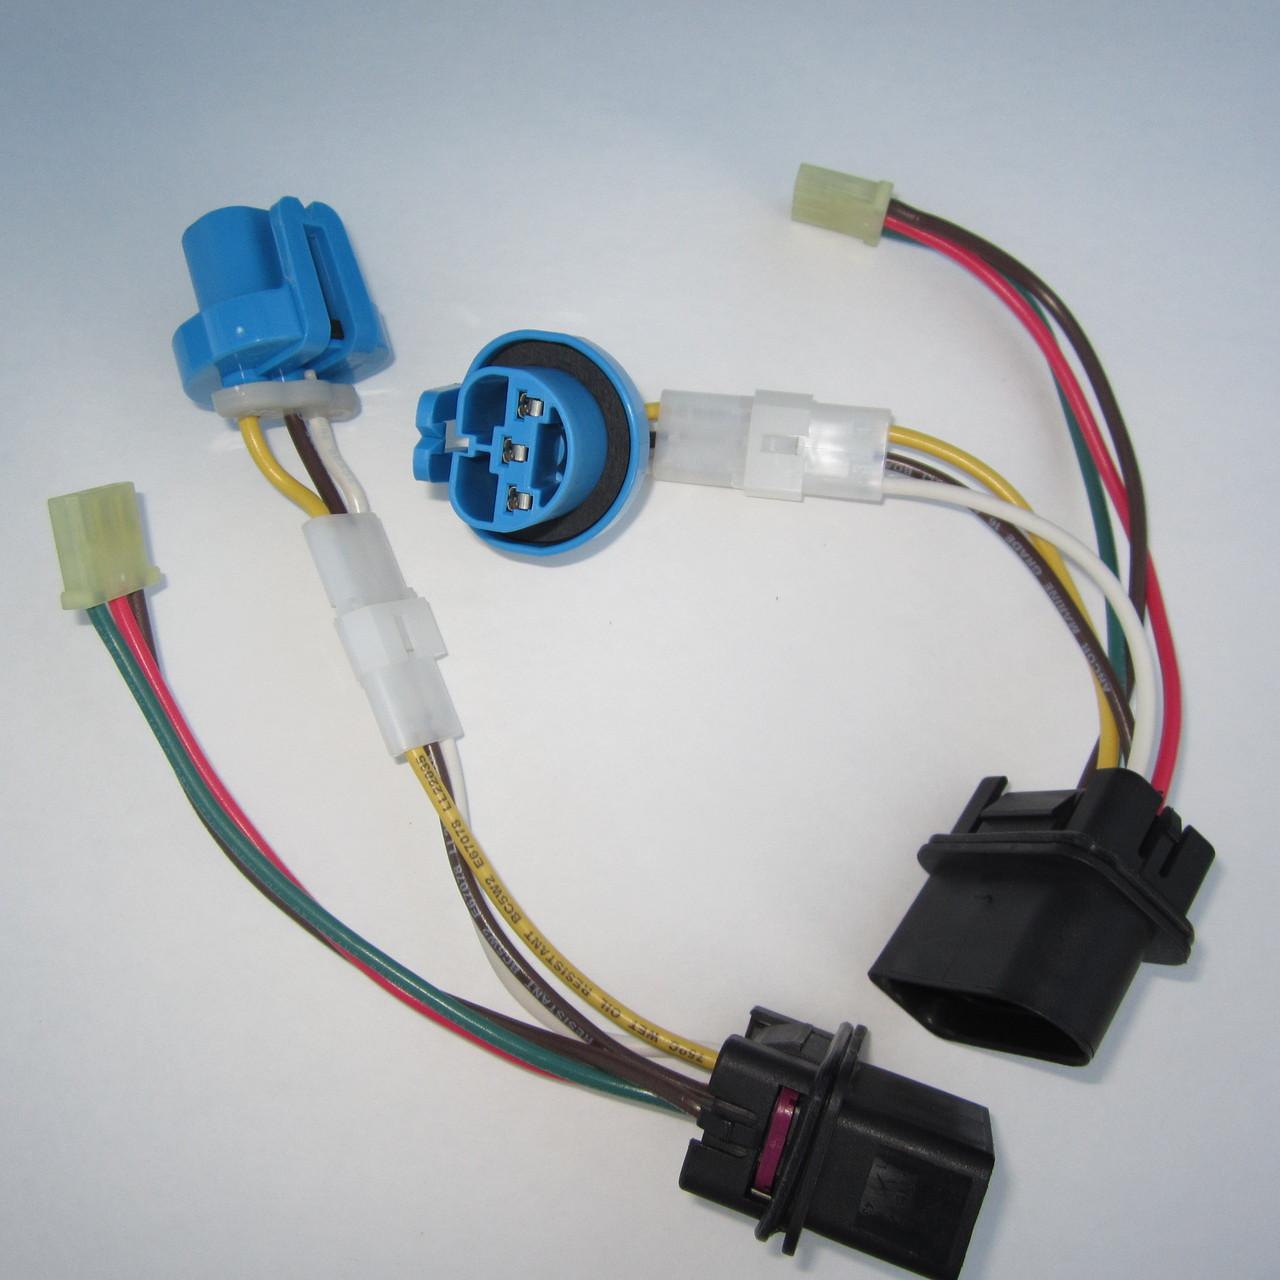 1999 vw jetta headlight harness radio wiring diagram u2022 2005 vw jetta wiring diagram 99 [ 1280 x 1280 Pixel ]